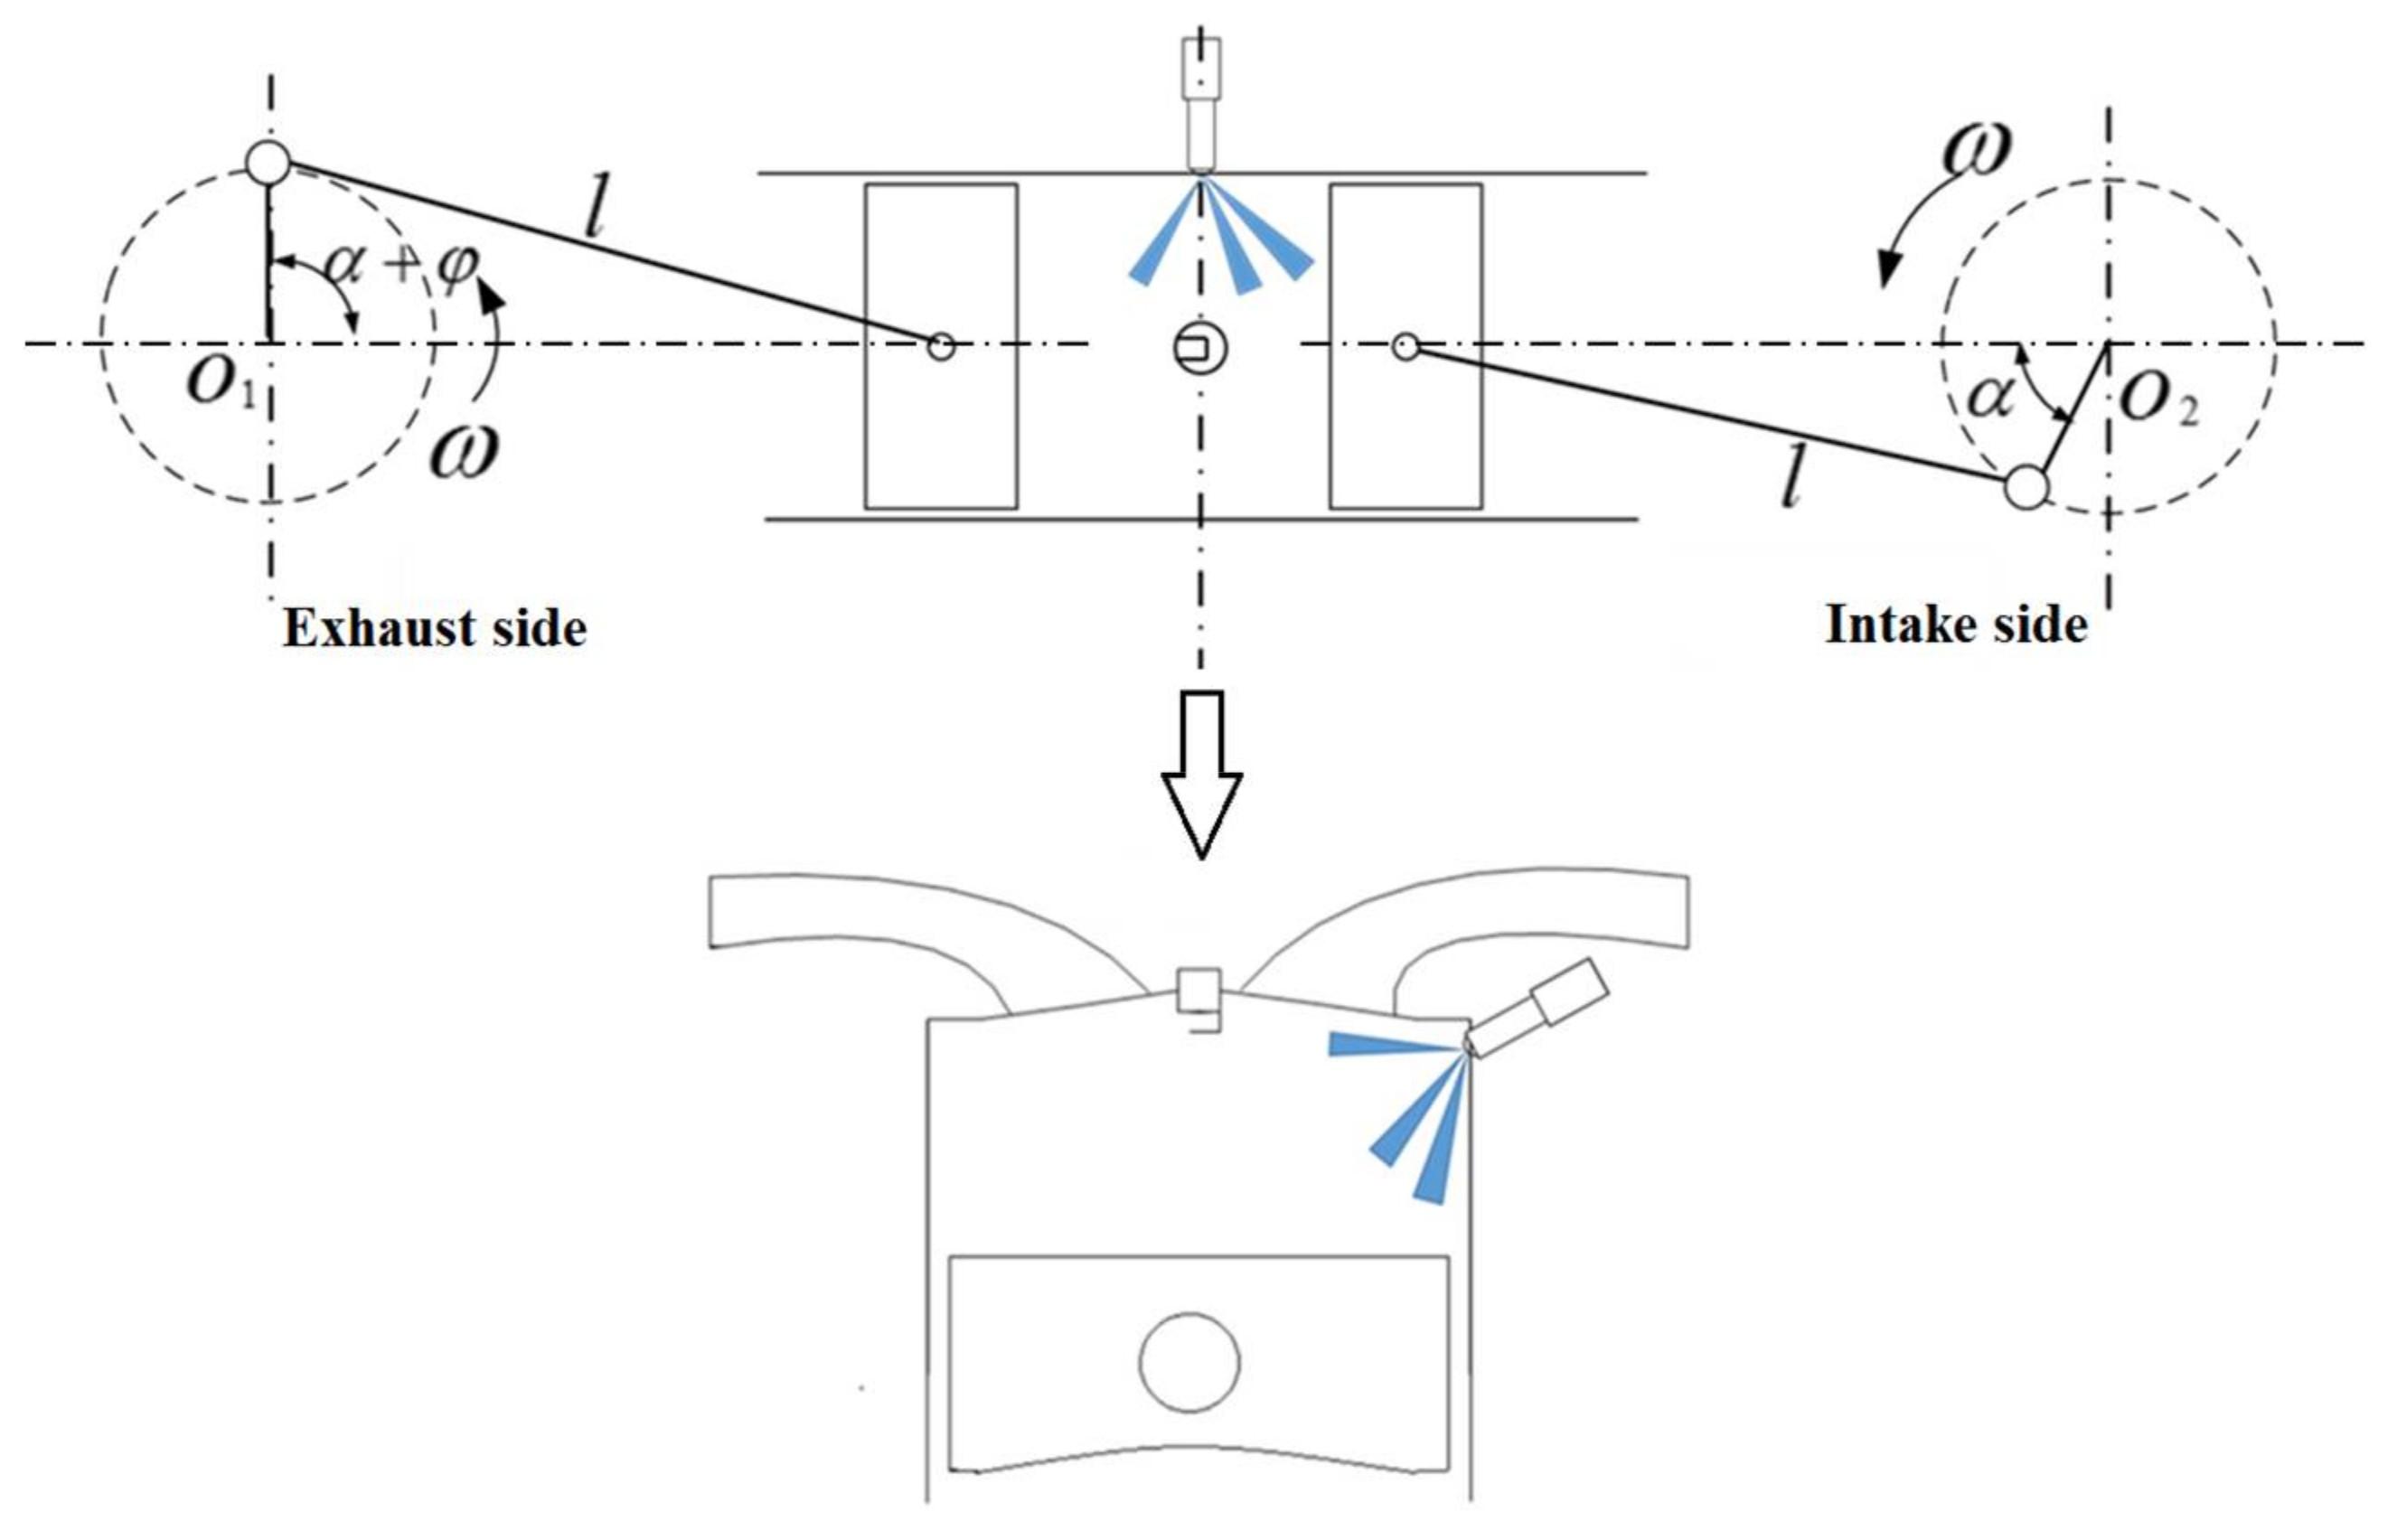 Valve Timing Diagram for Four Stroke Petrol Engine